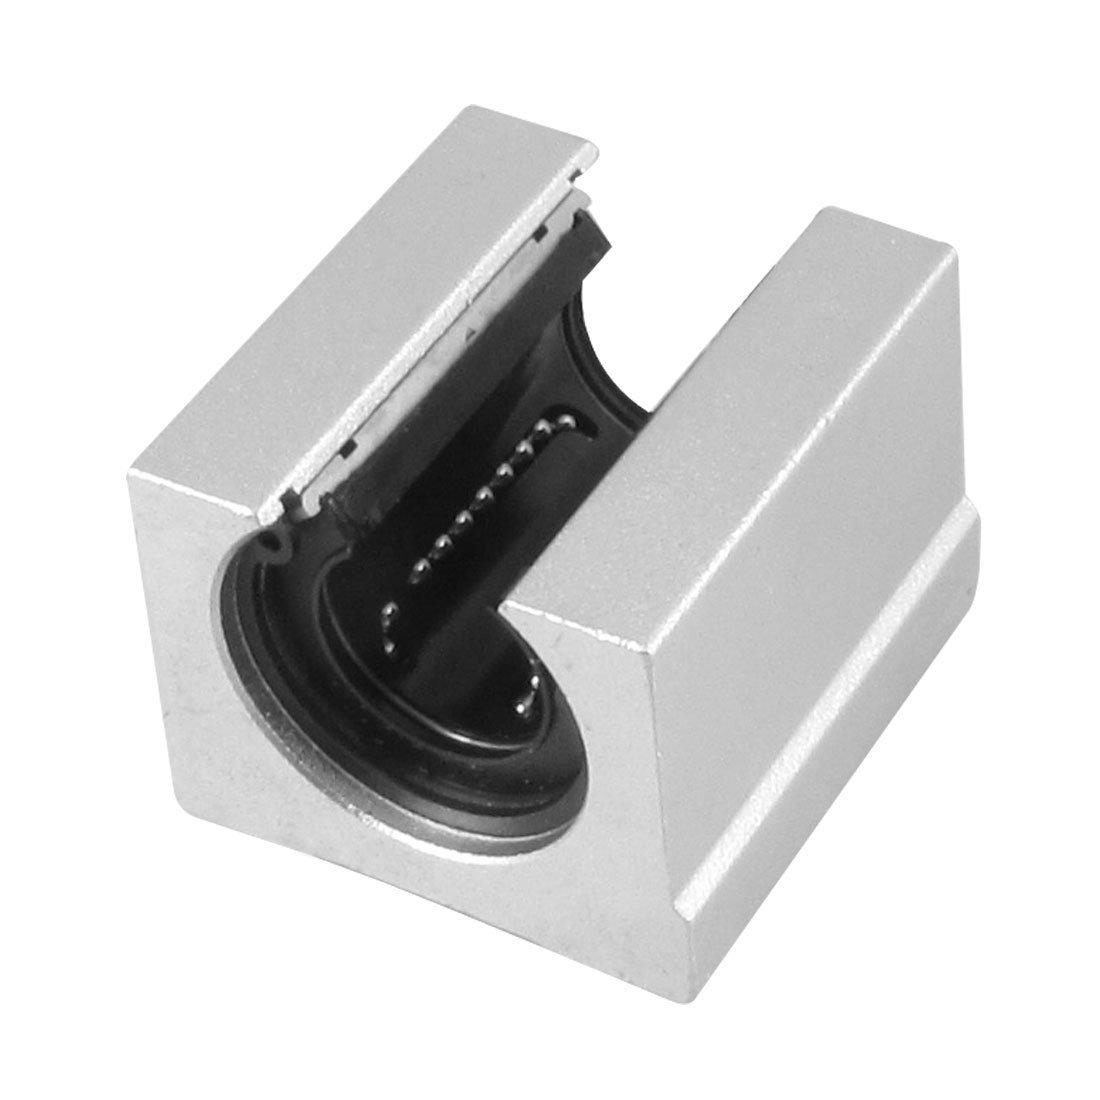 SBR20UU Metall Linear Motion-Kugellager Lagerblock DealMux DLM-B00HCHFH48